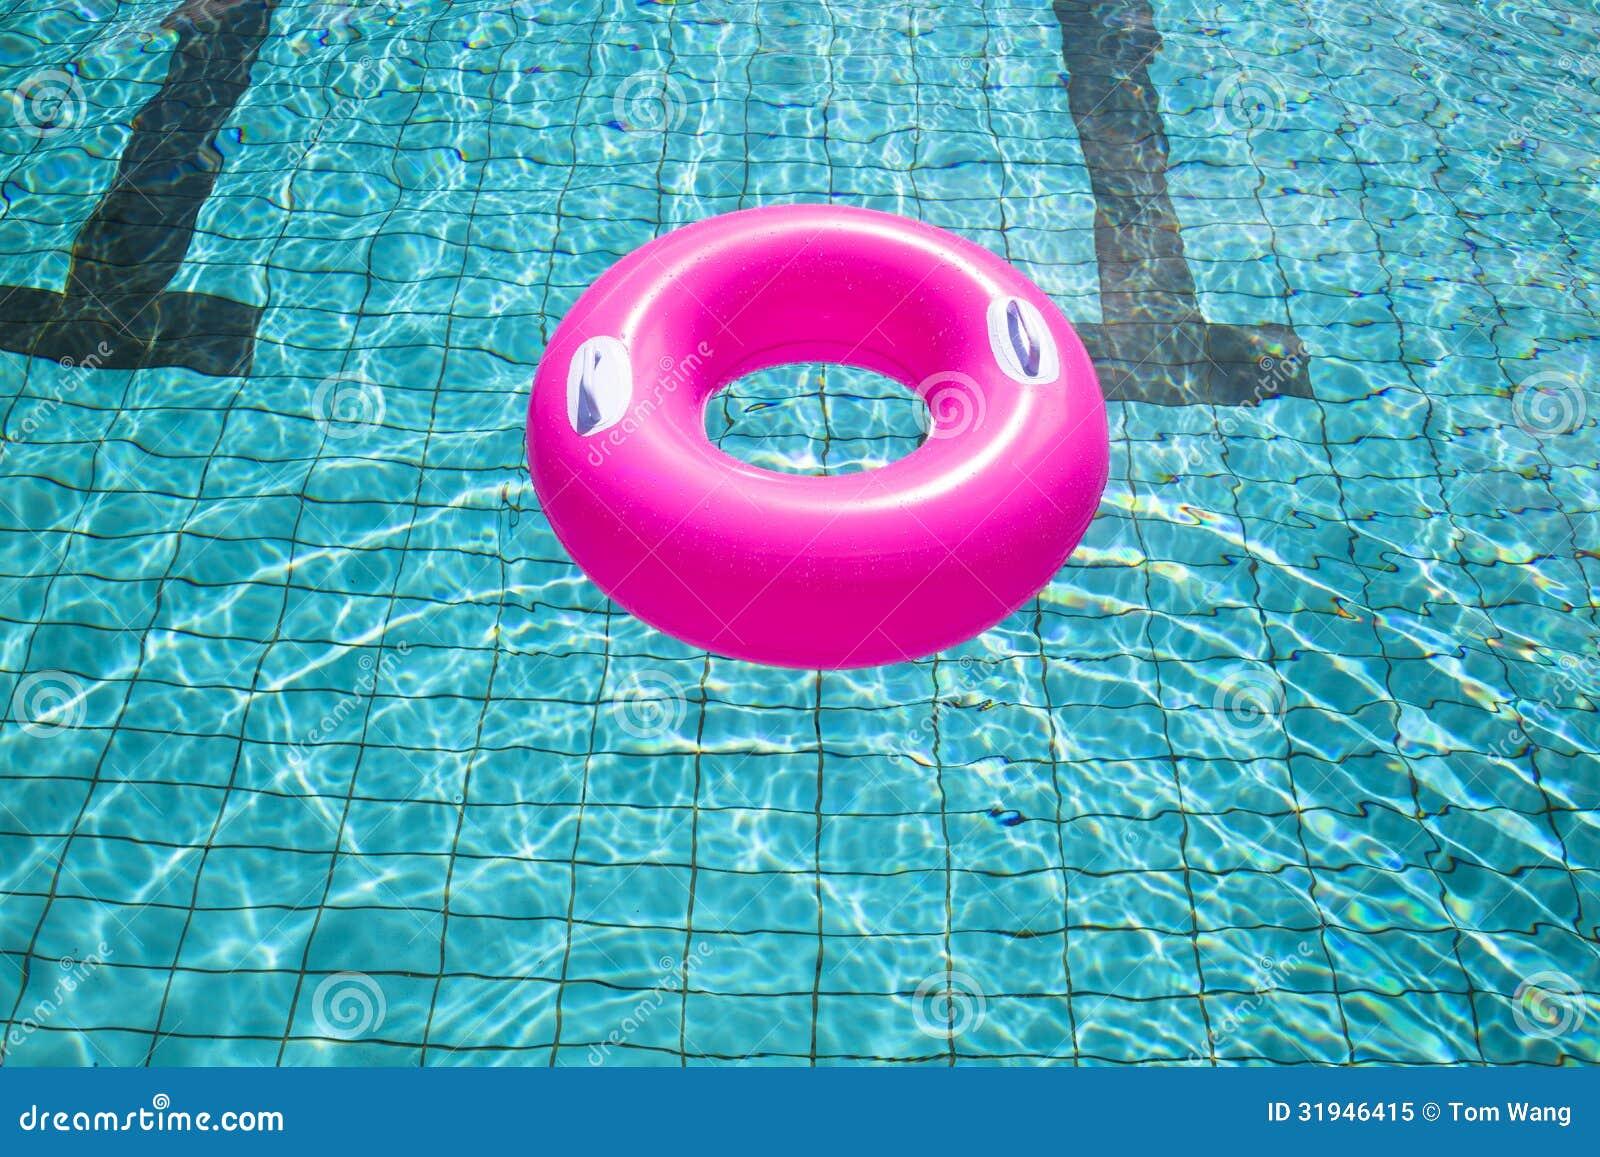 Swimming Pool Rings Royalty Free Stock Photo Image 31946415